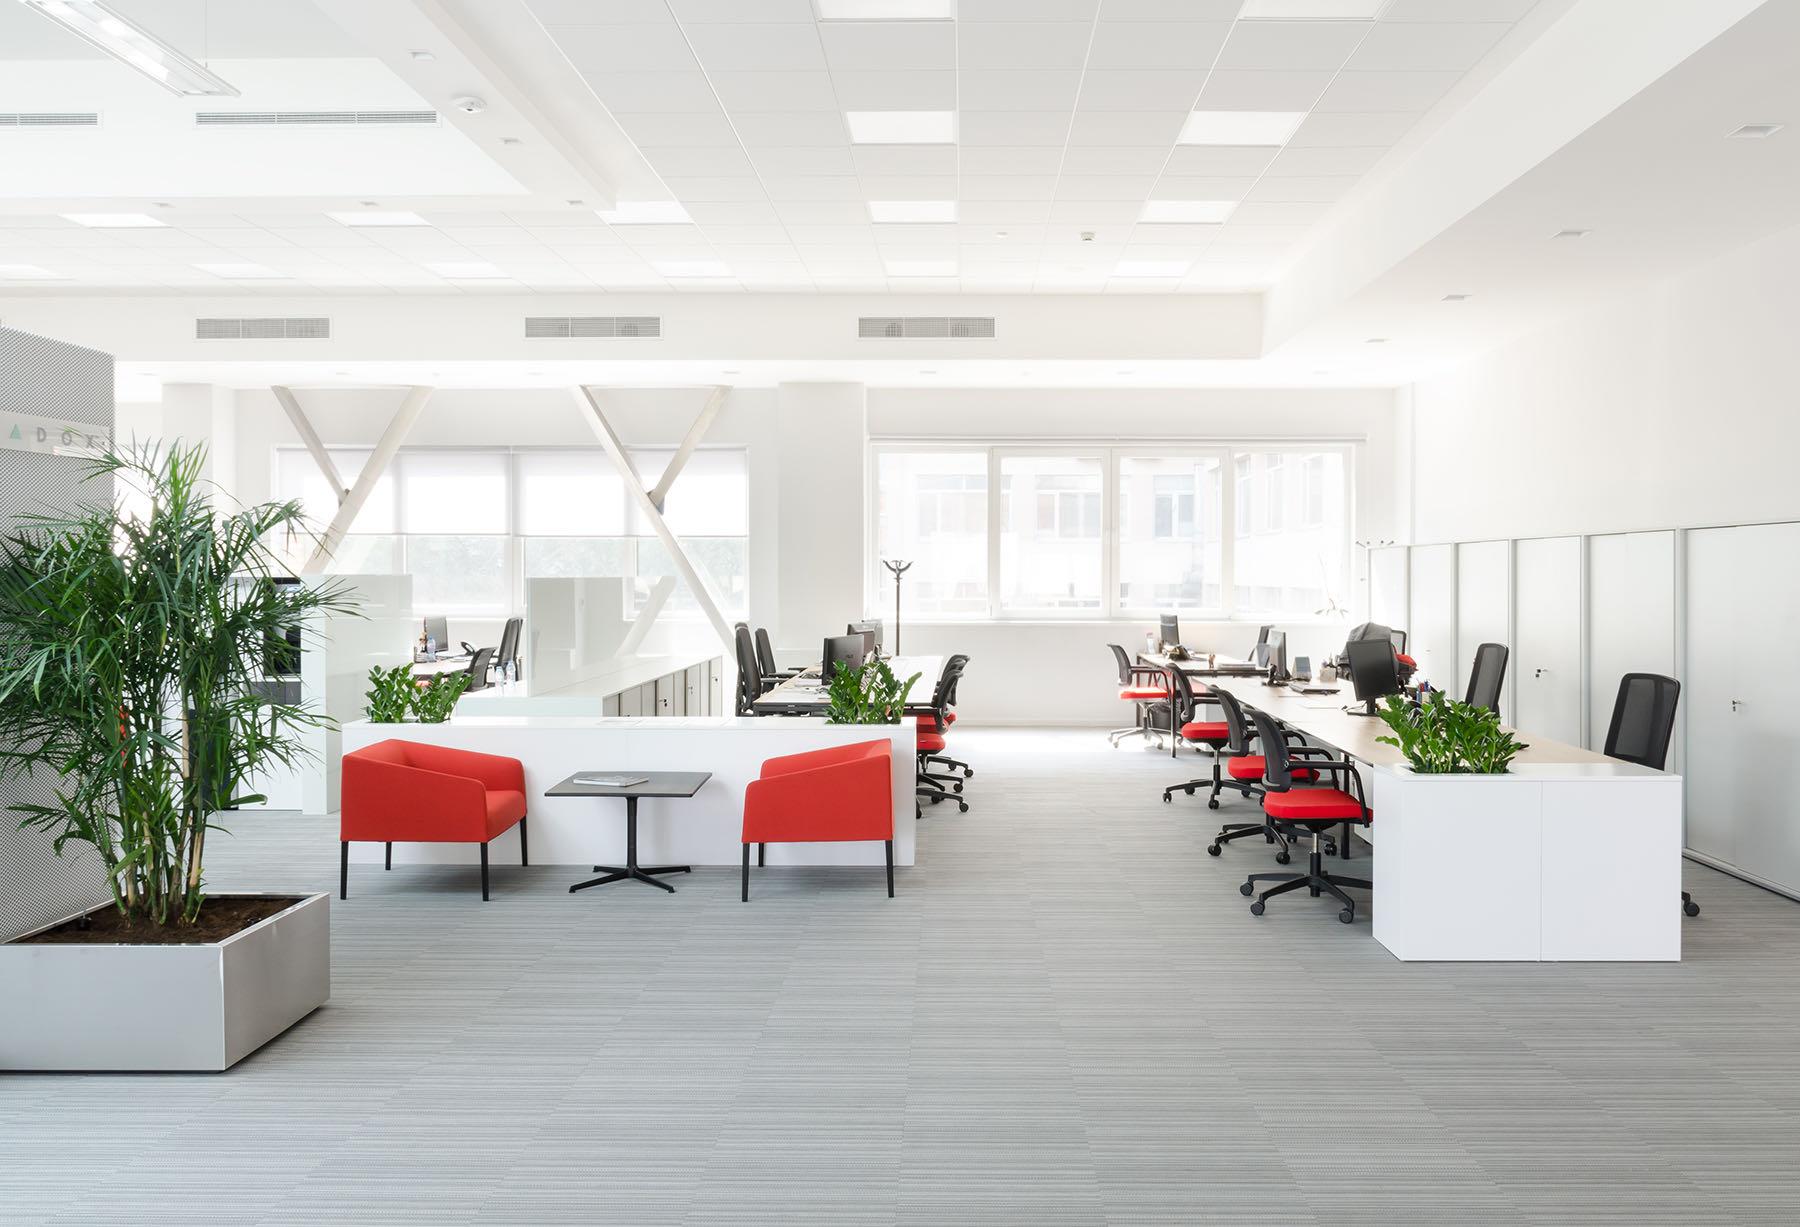 sectron-officee-sofia-2